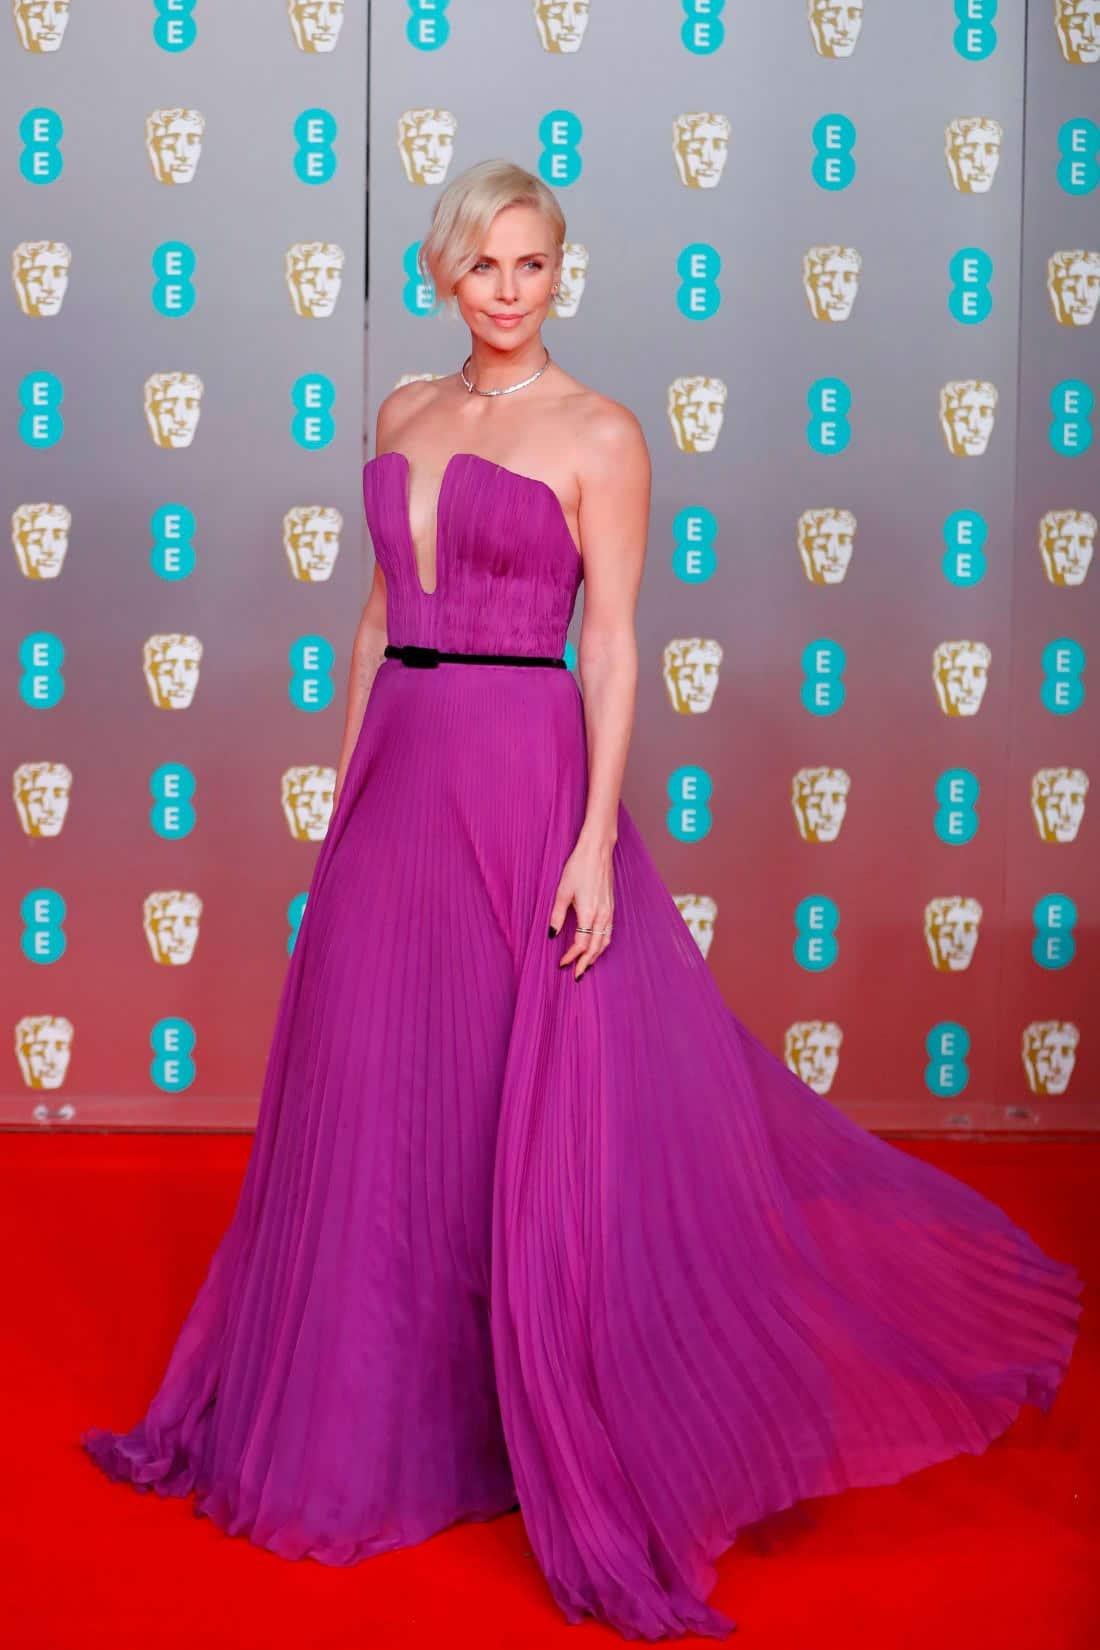 Charlize Theron at The BAFTAs 2020